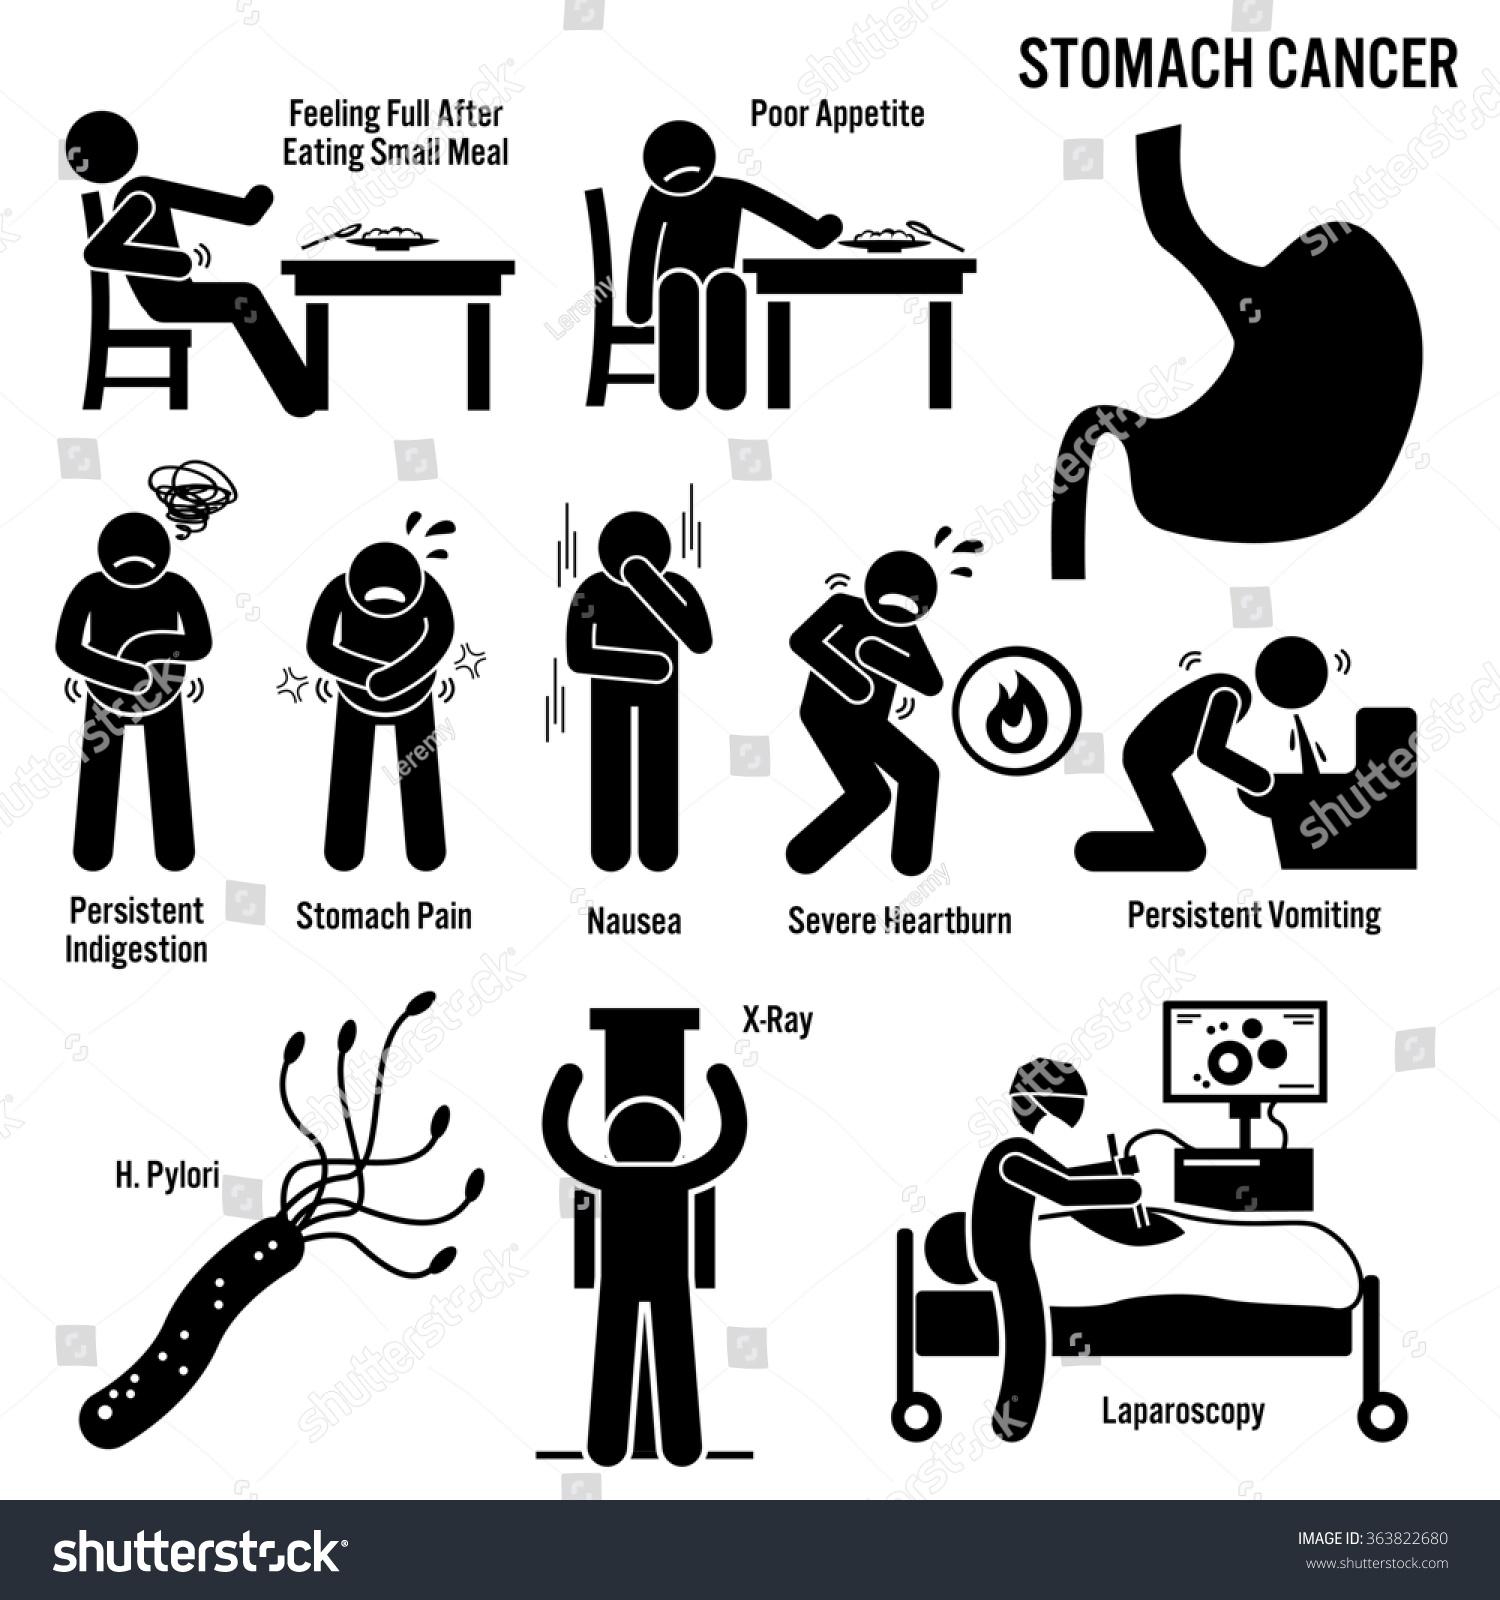 stomach cancer symptoms